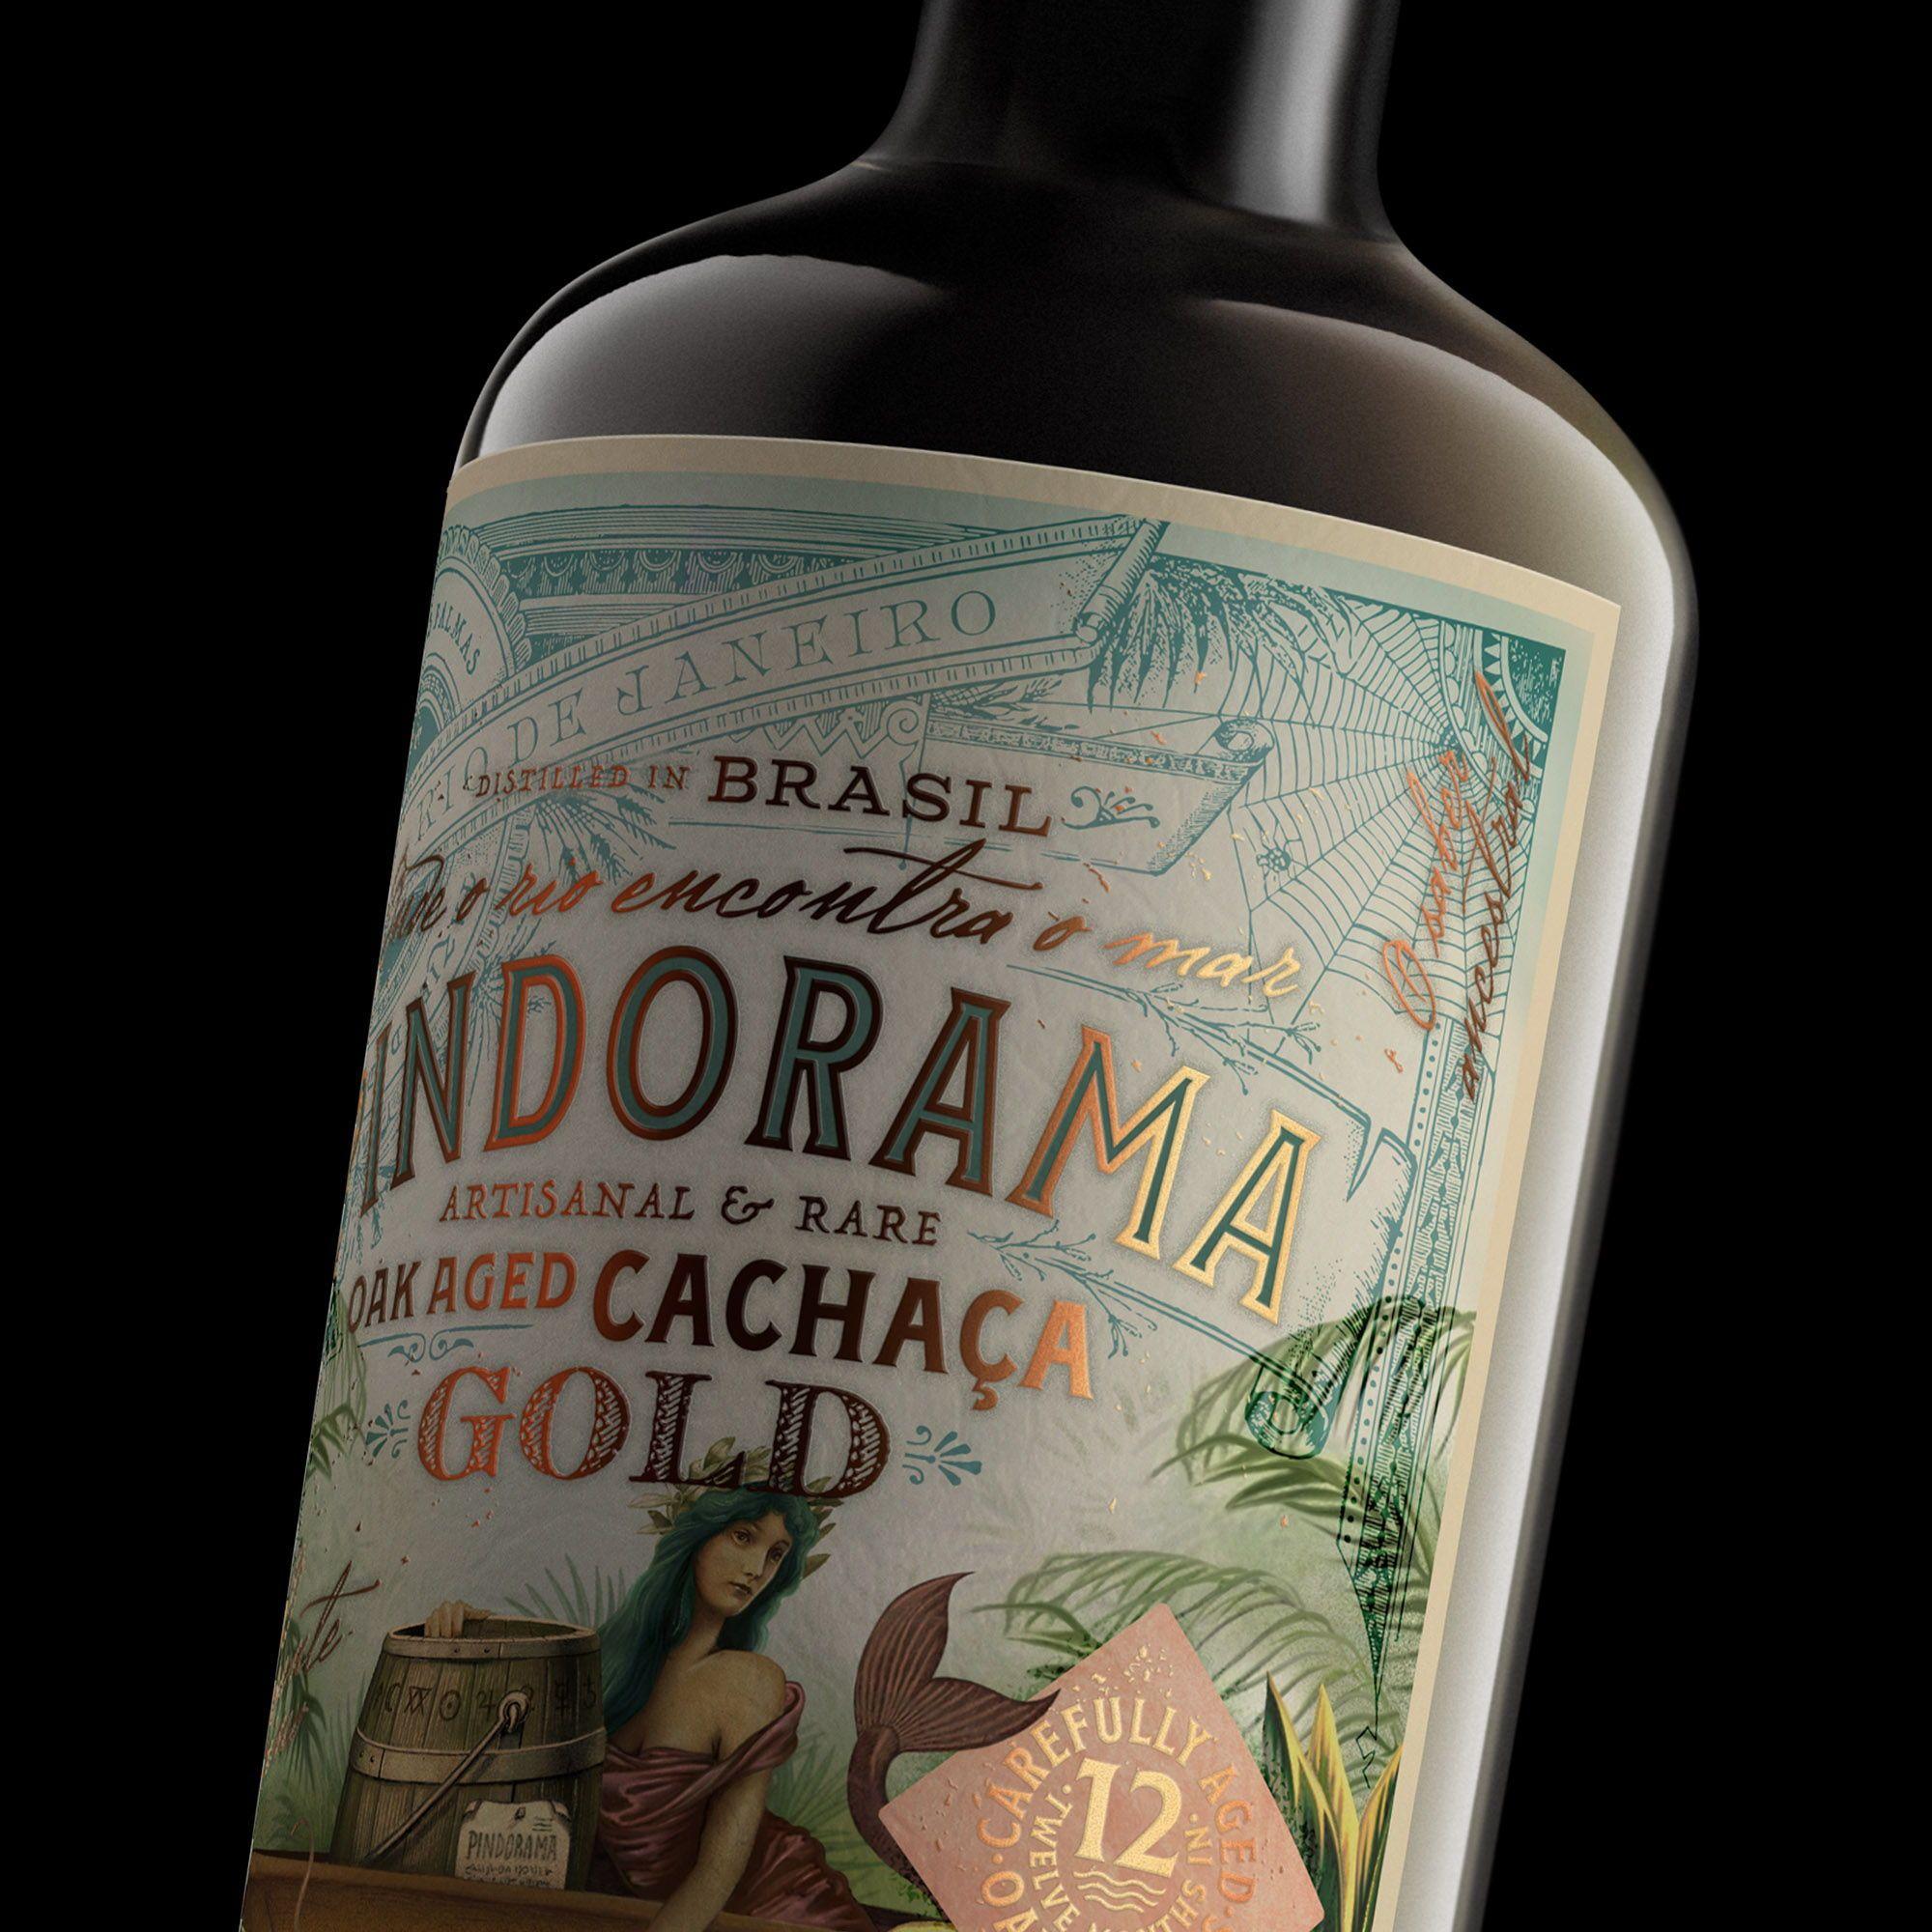 Pindorama Gold Features A Fantastical Illustrated